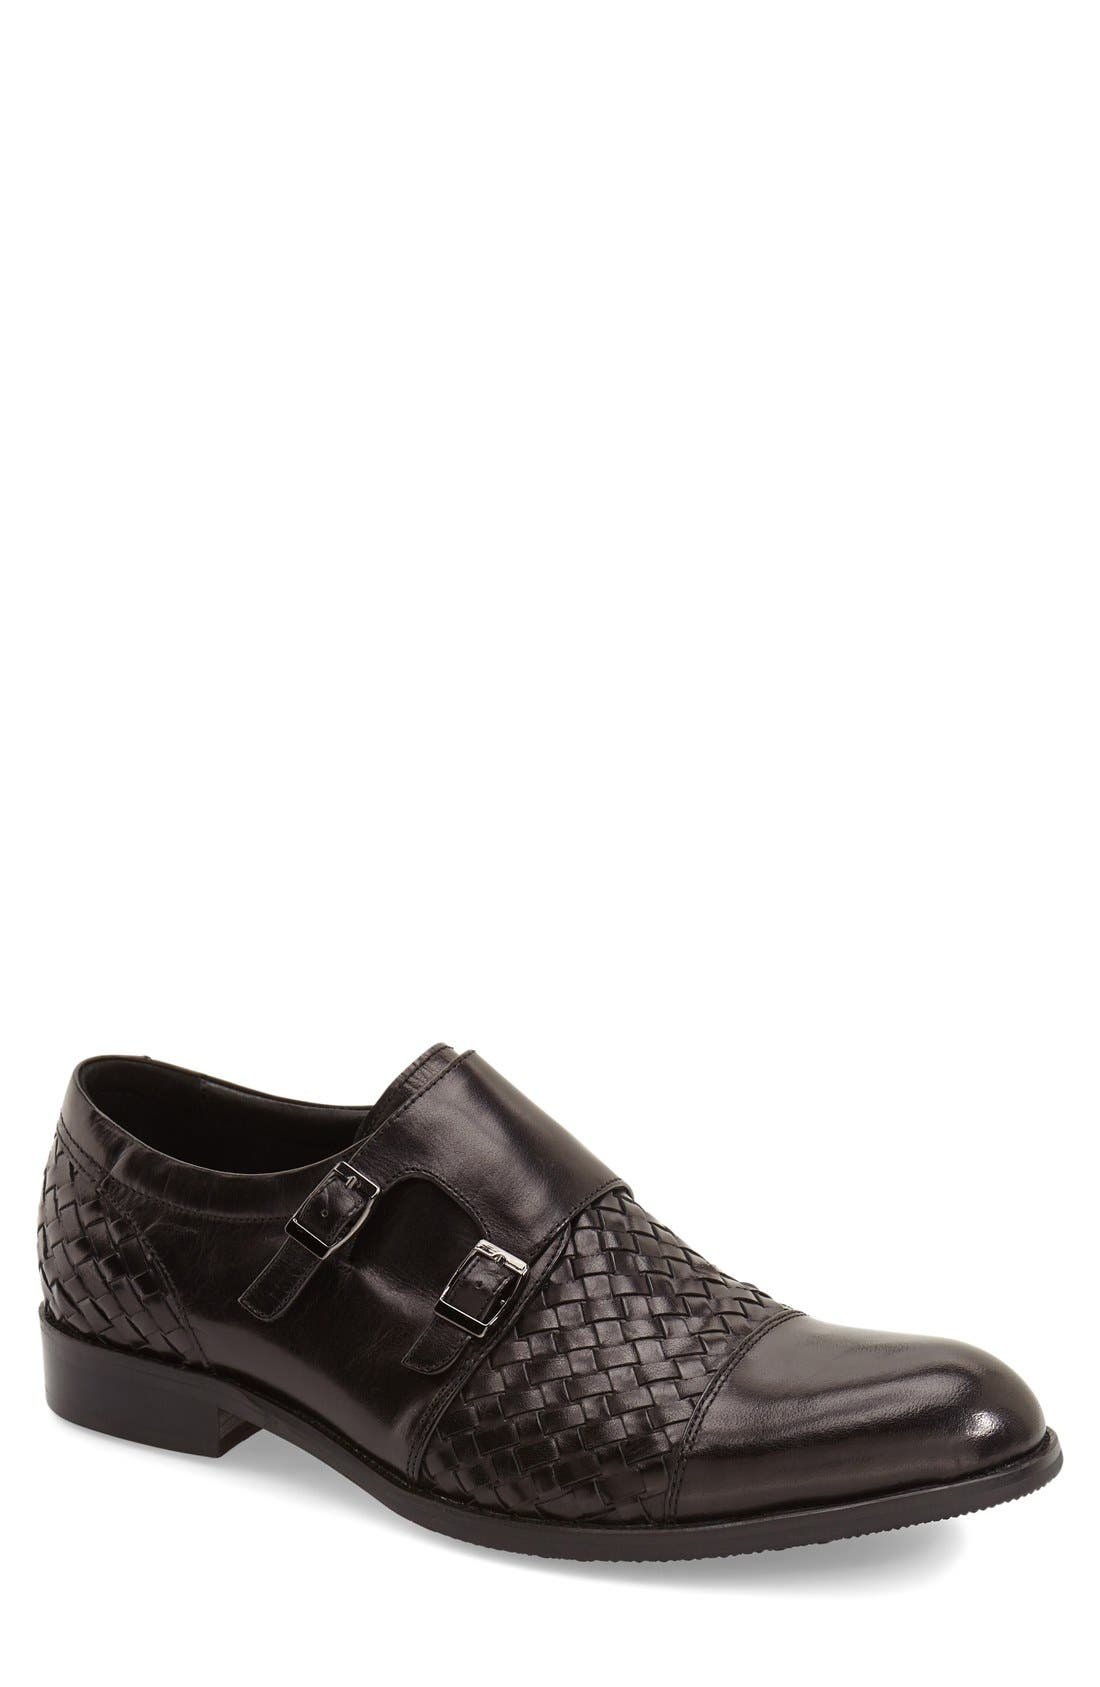 'Mahler' Monk Strap Shoe,                             Main thumbnail 1, color,                             Black Leather